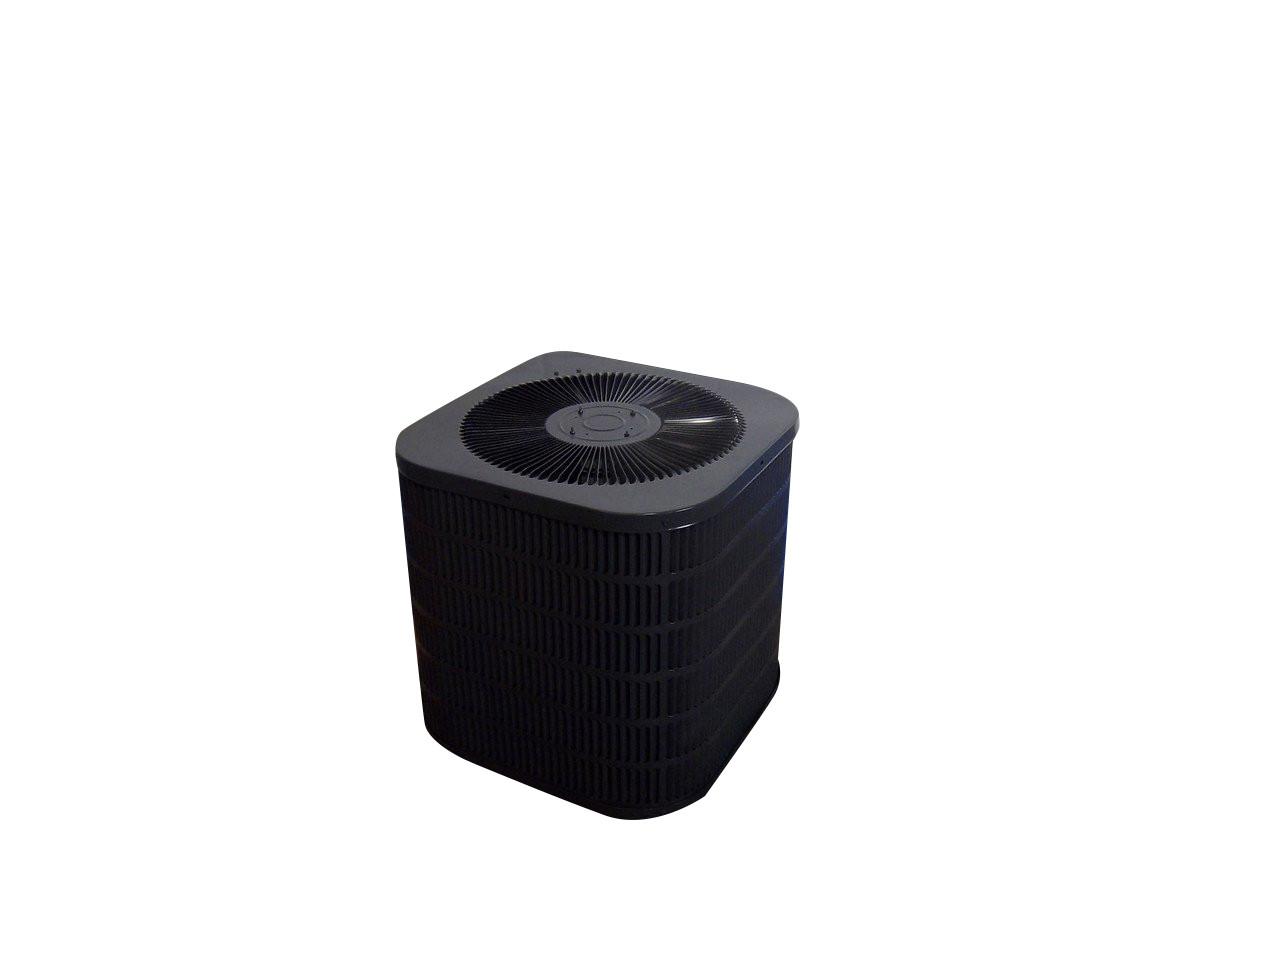 trane condenser fan motor wiring diagram images air conditioner air conditioner condenser best home design and [ 1280 x 960 Pixel ]